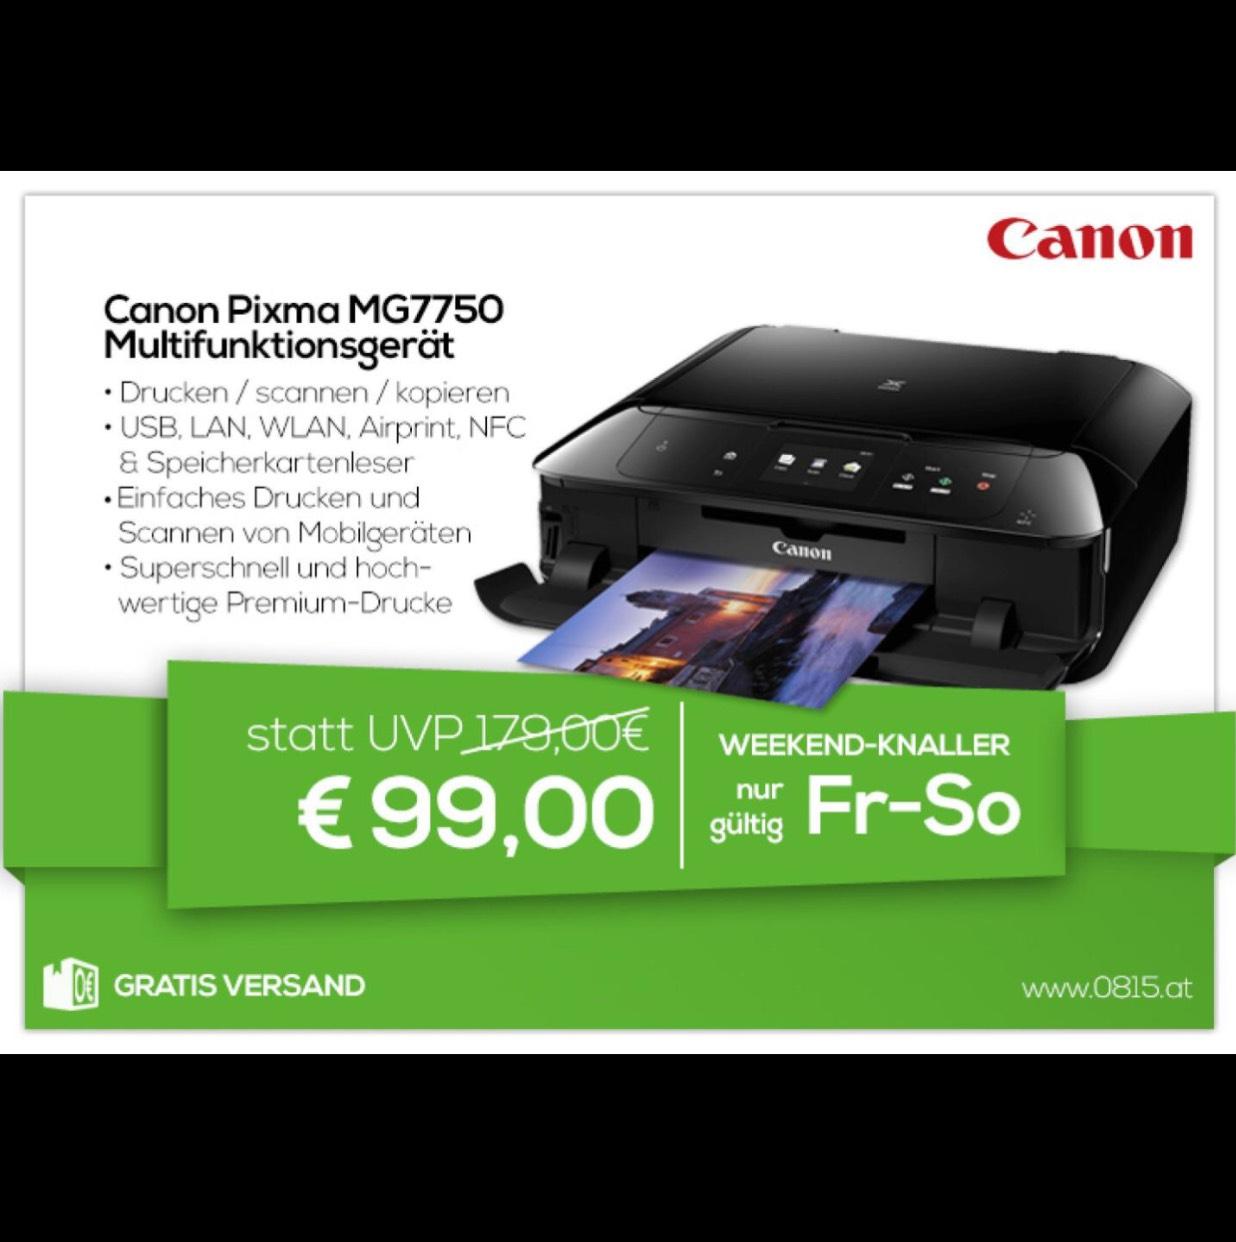 Canon Pixma MG7750 Multifunktionsgerät